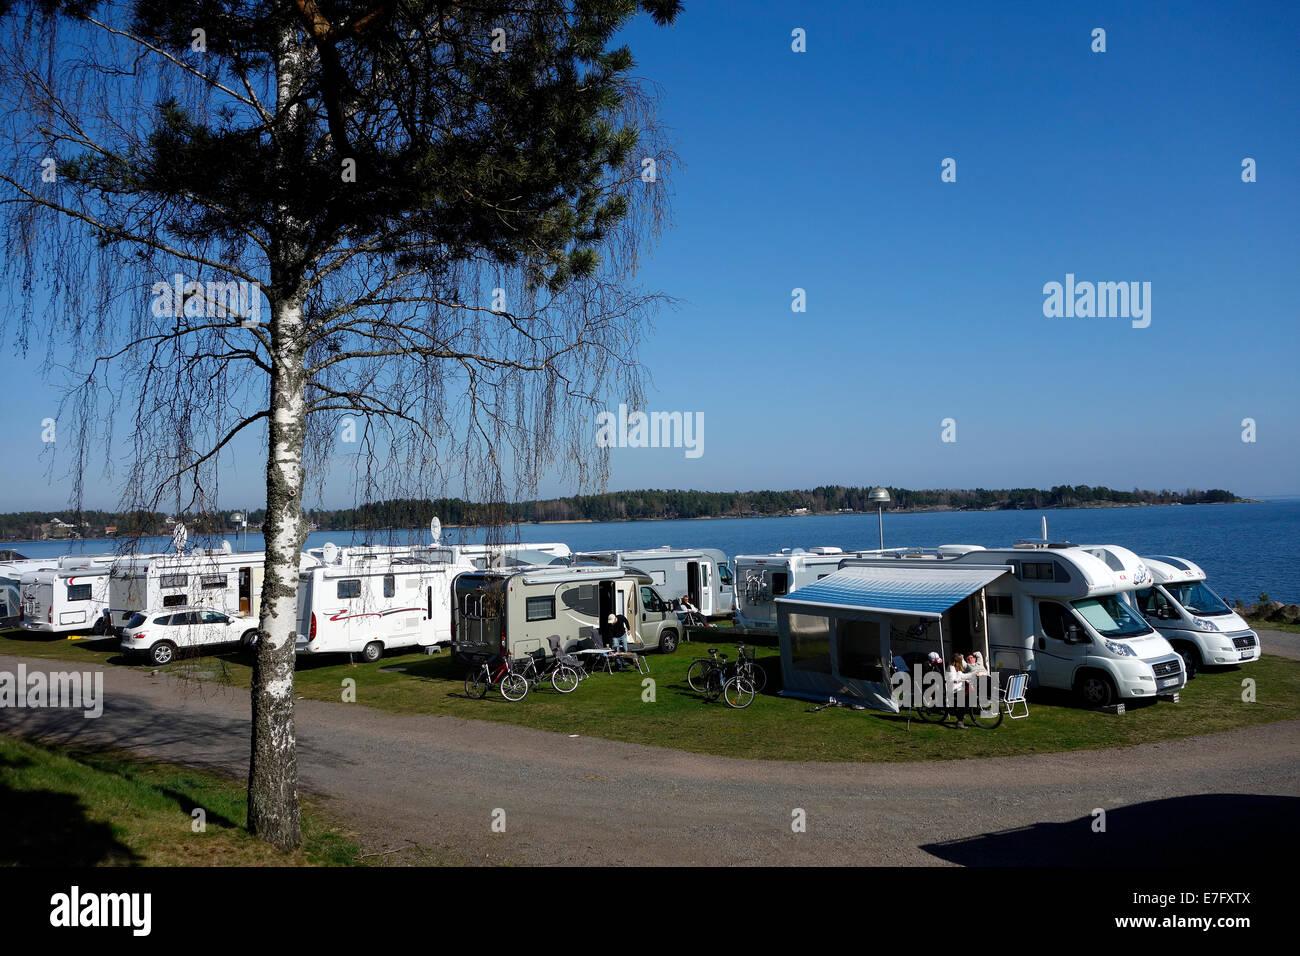 Recreational vehicle and caravans lines up in Örnäs Camping Site, Åmål, Sweden - Stock Image